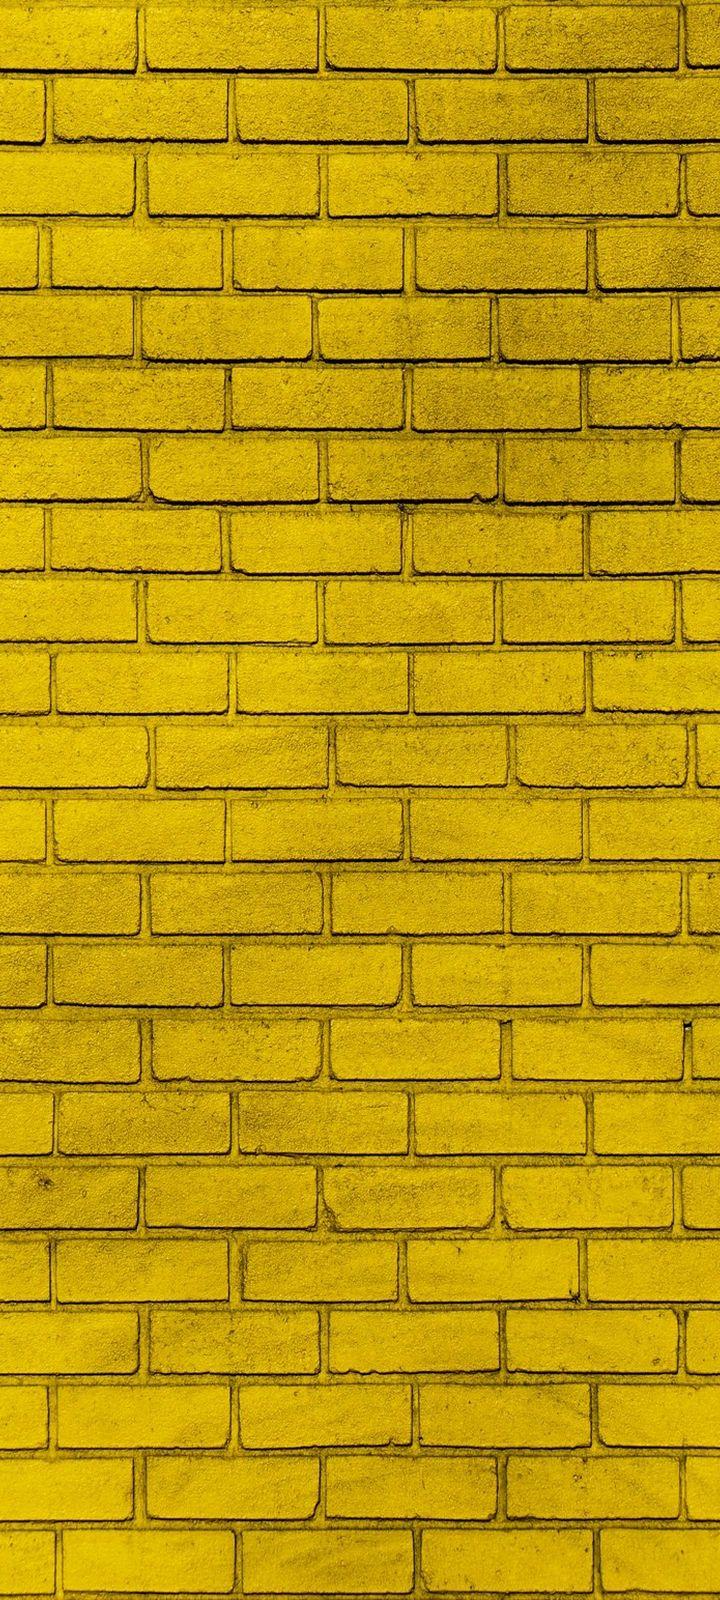 Wall Brick Yellow Wallpaper 720x1600